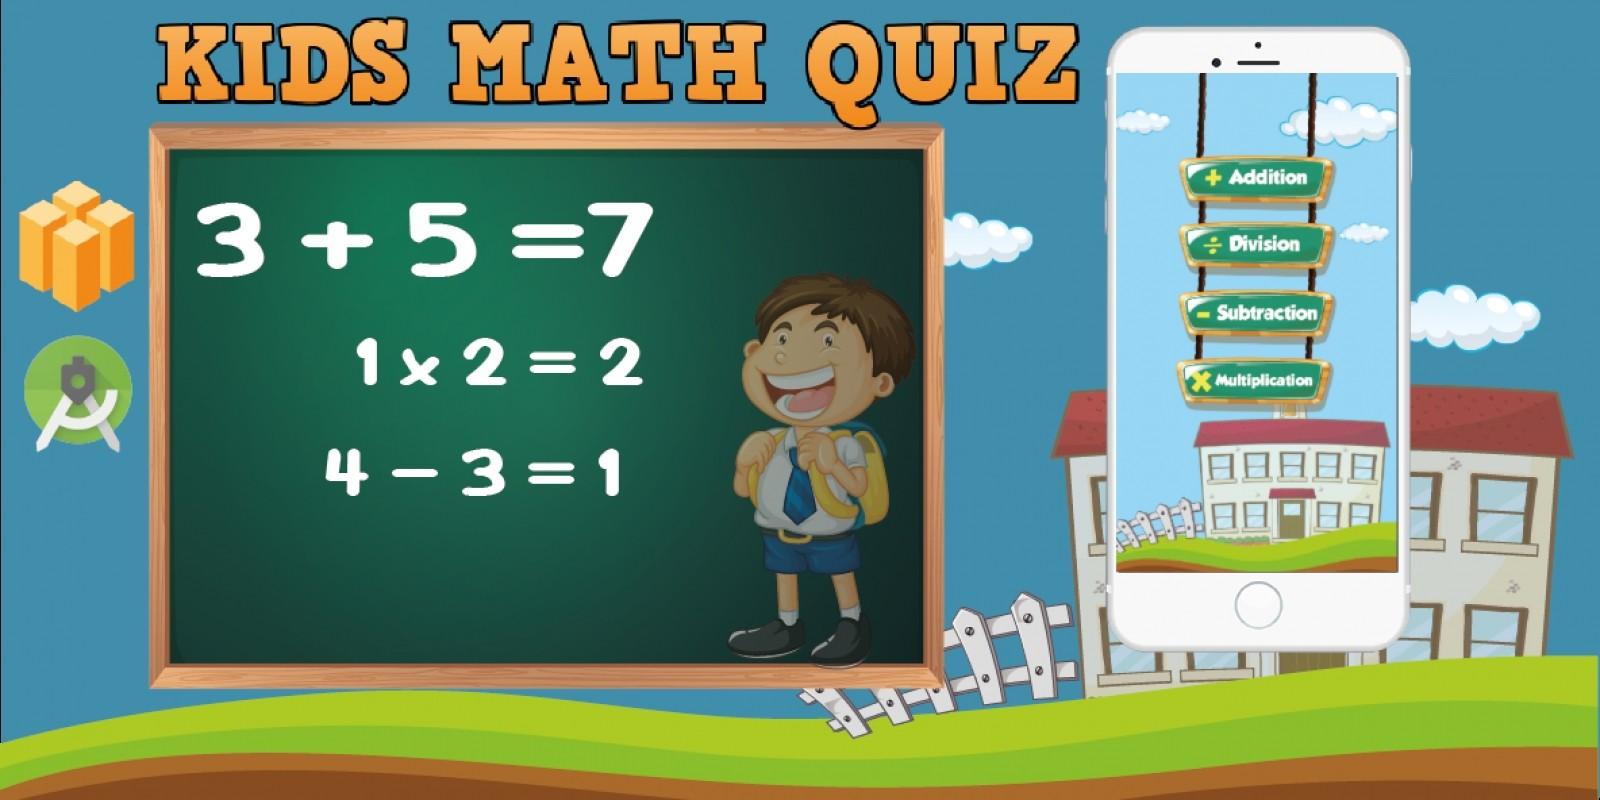 Kids Math Quiz - Buildbox Template